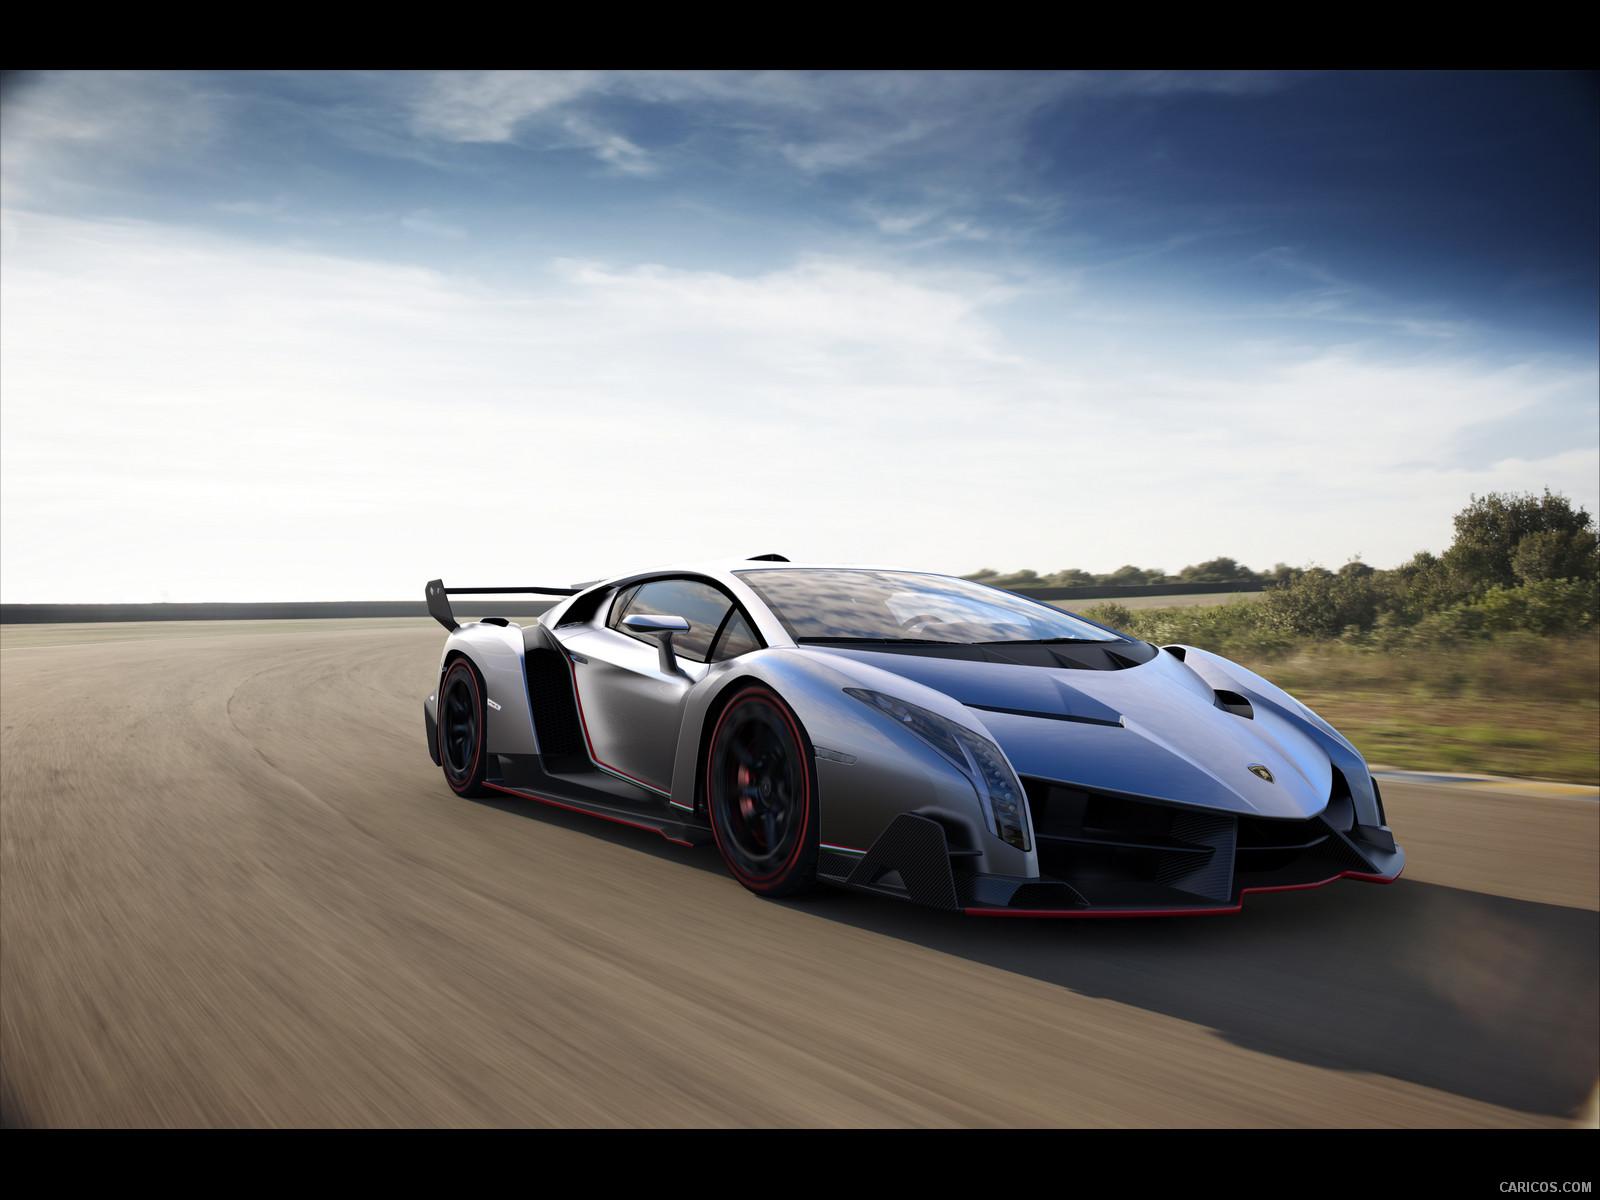 Lamborghini-Veneno-Wallpaper-HD-09